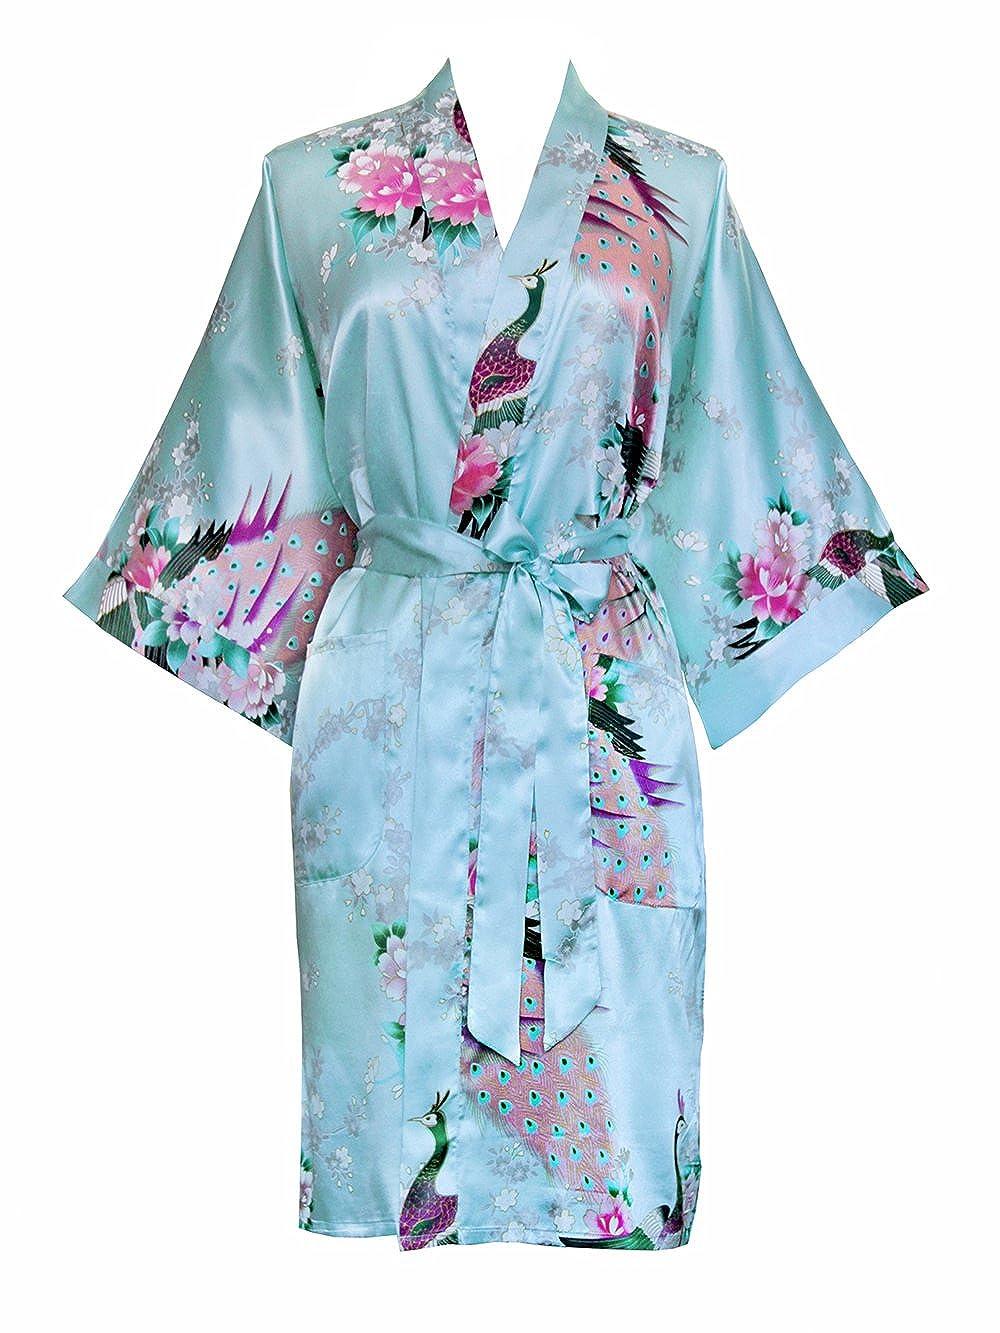 Old Shanghai Women's Kimono Short Robe - Peacock & Blossoms one size KMS01PT-aqua